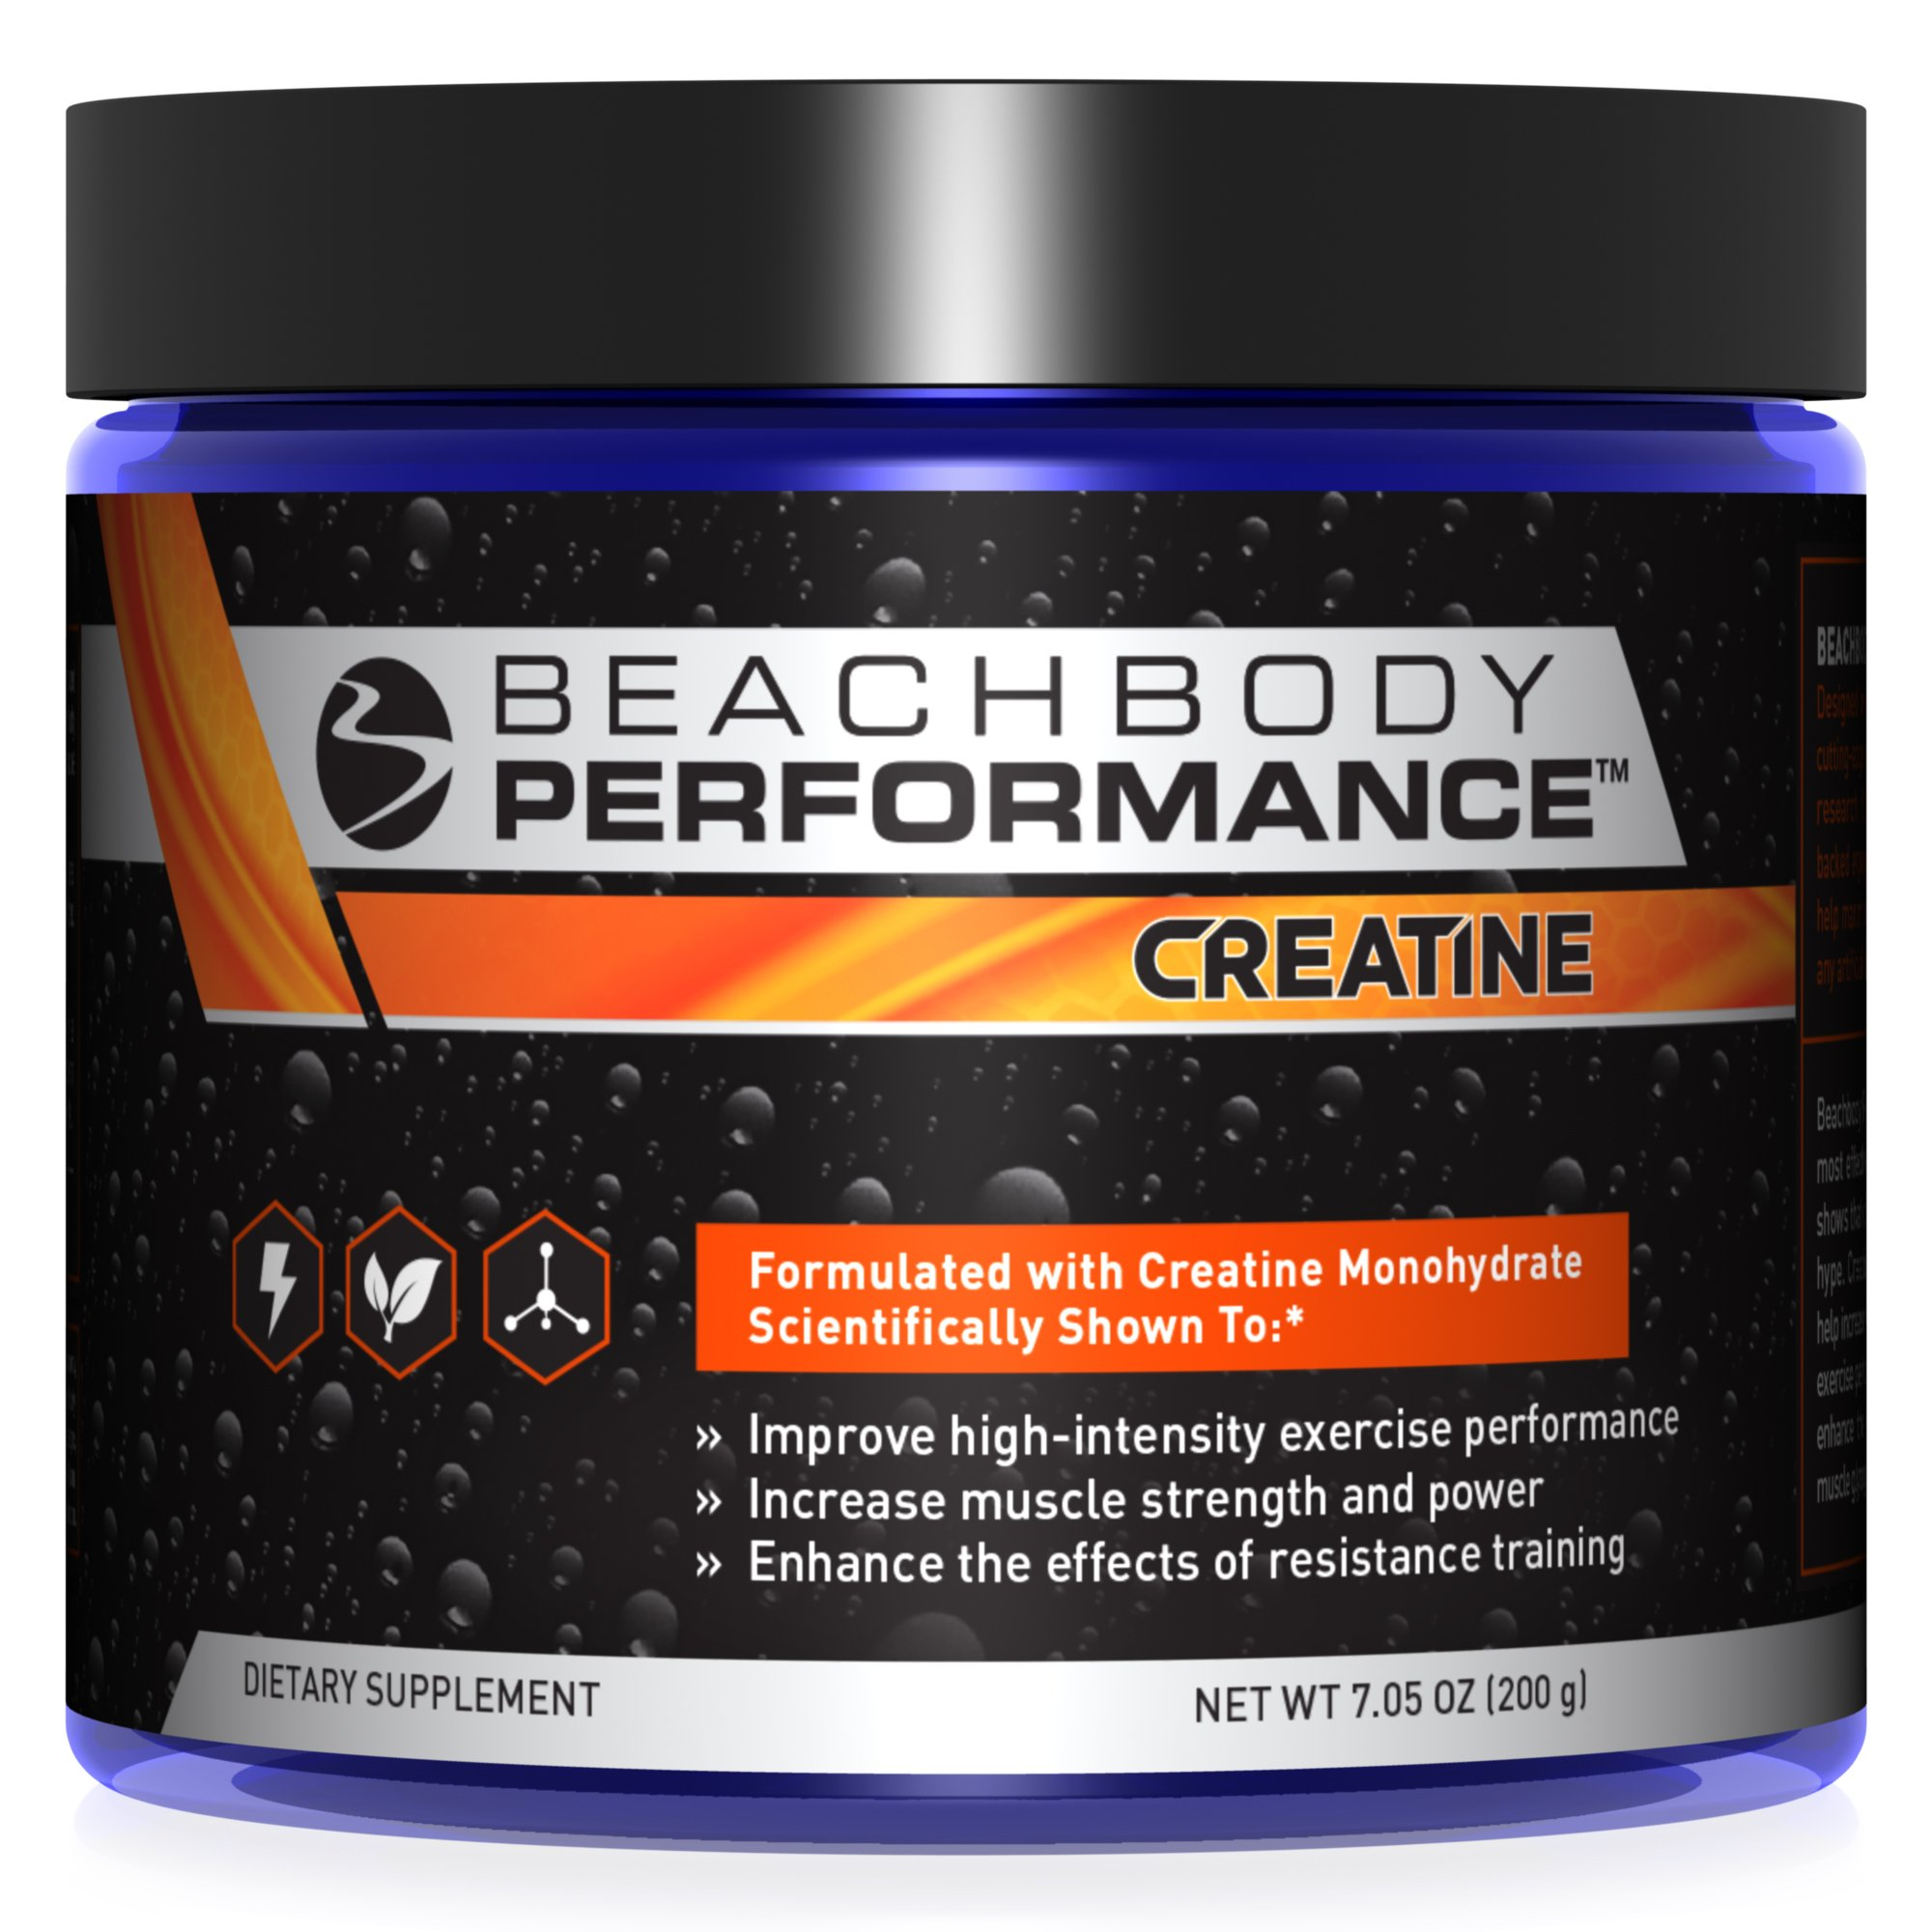 Beachbody Performance - Creatine 20 Serving Tub